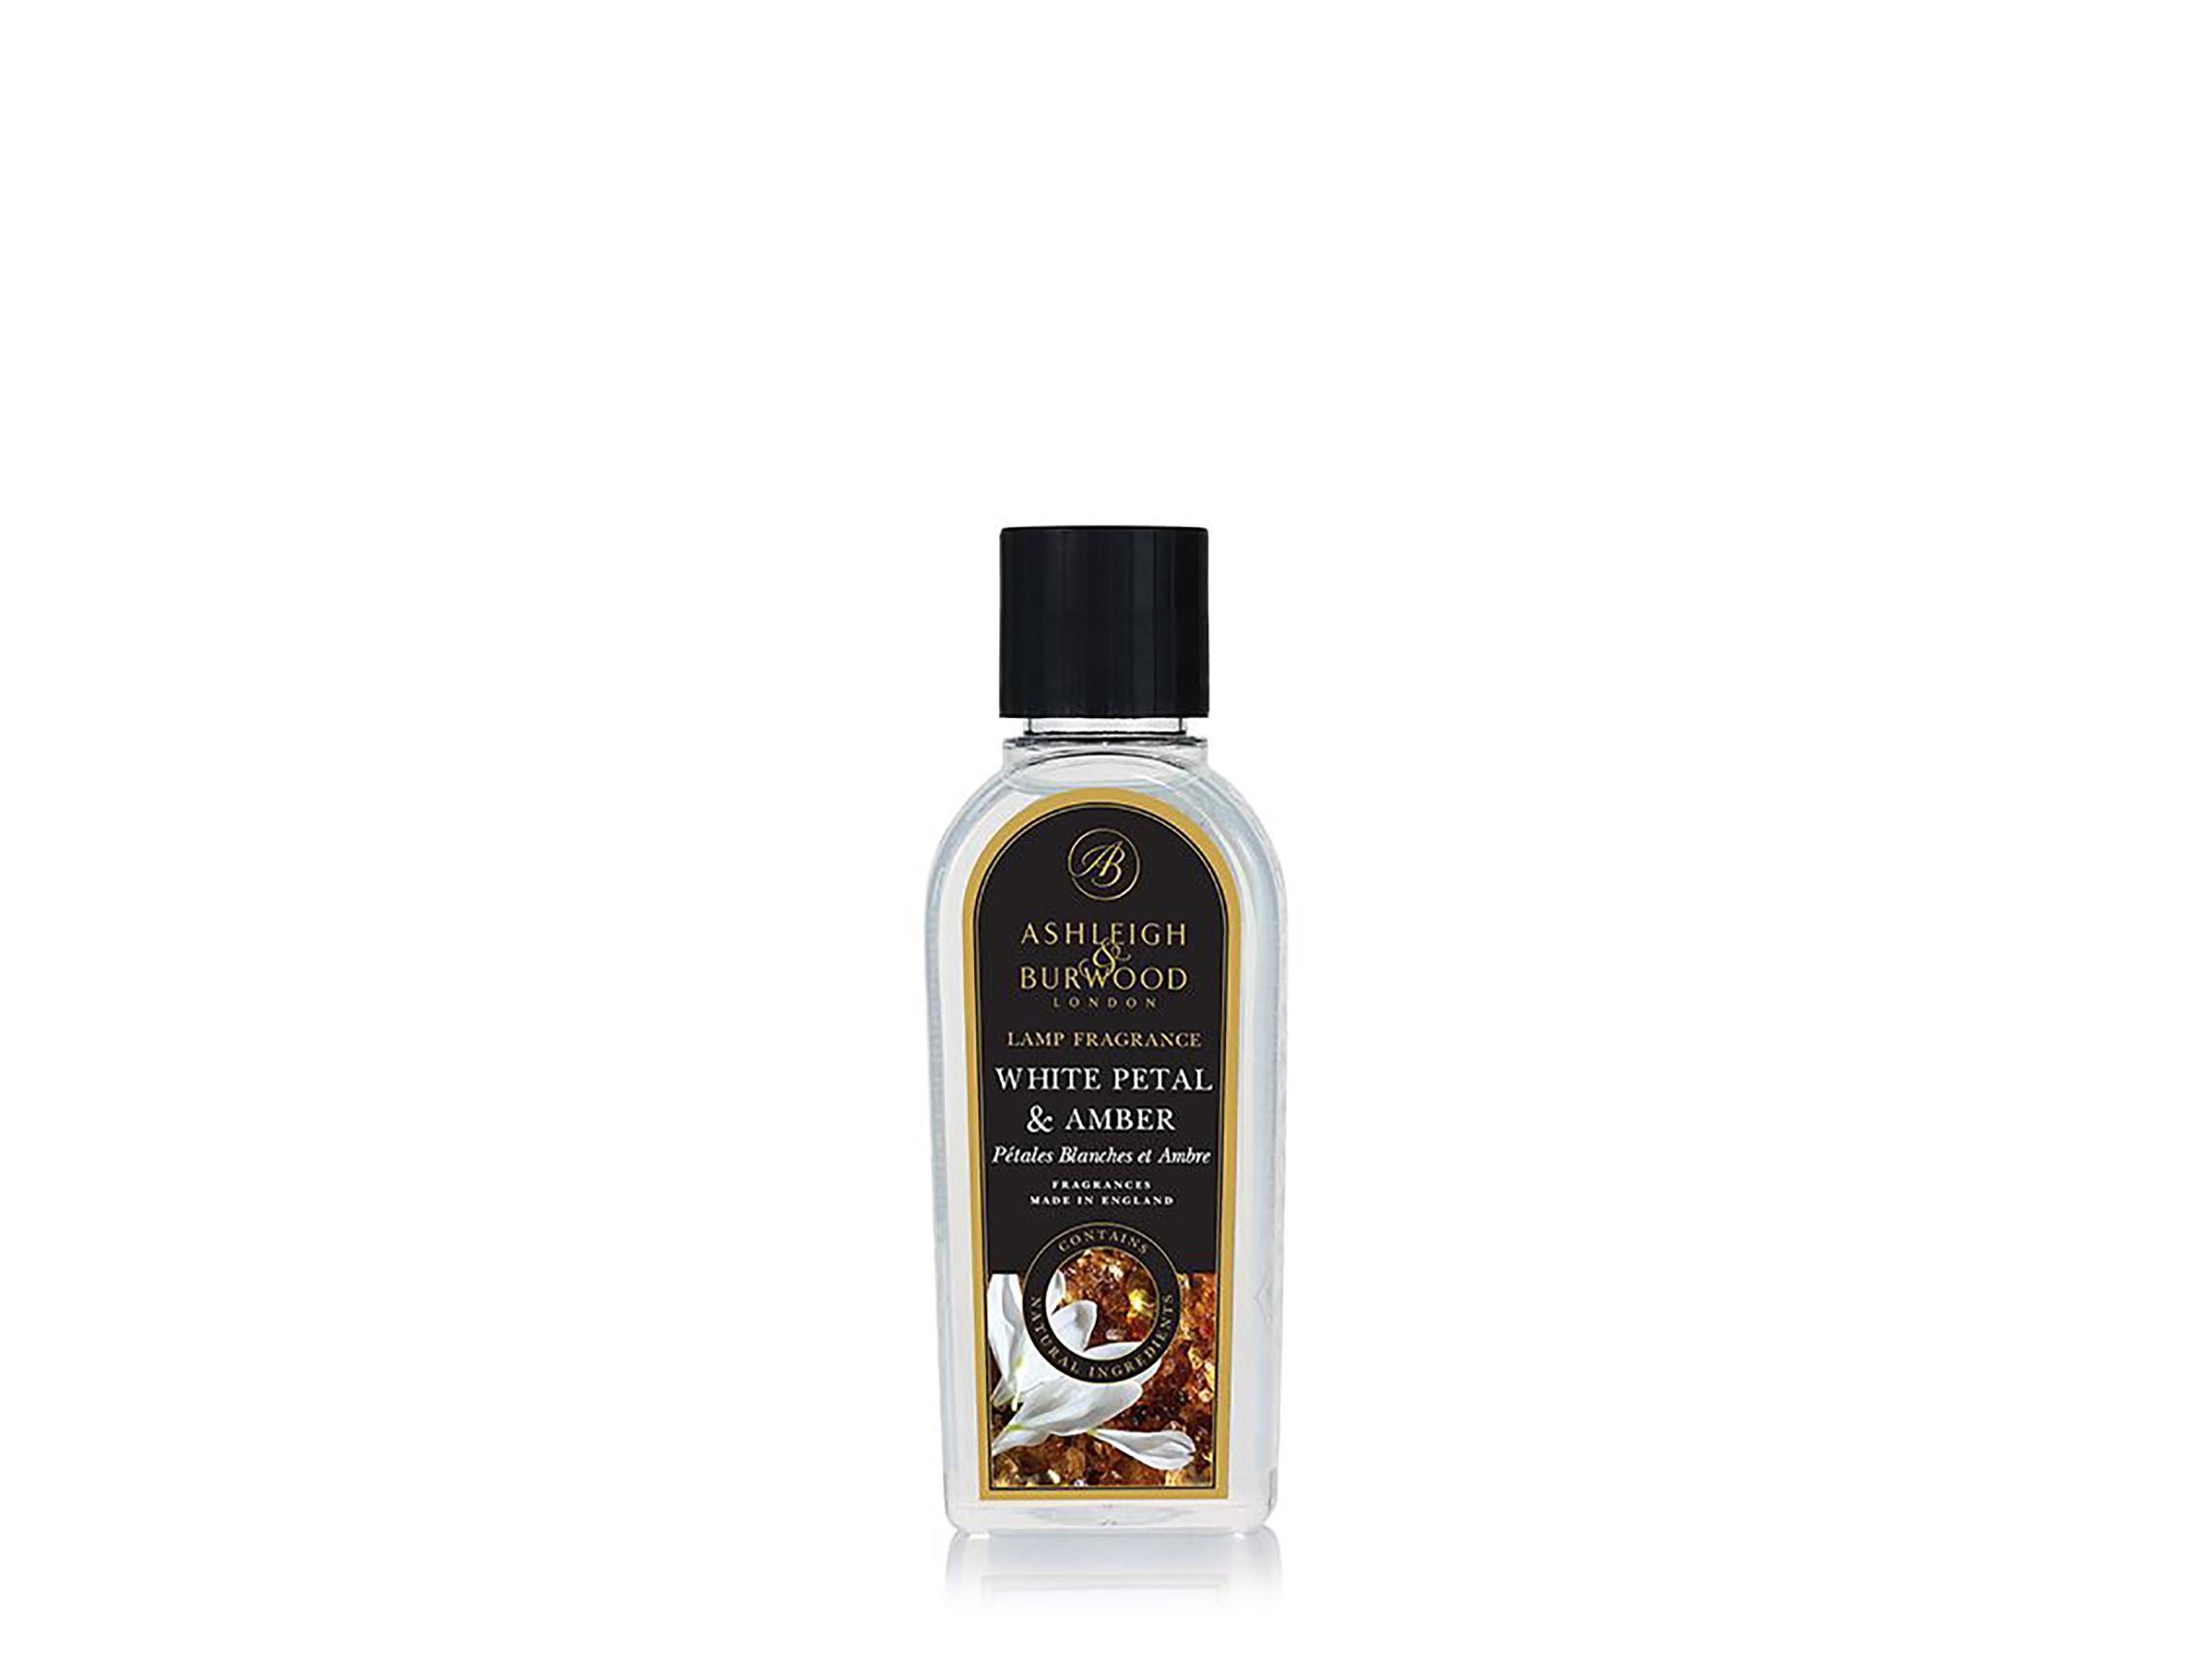 Geurlamp olie White Petal & Amber S